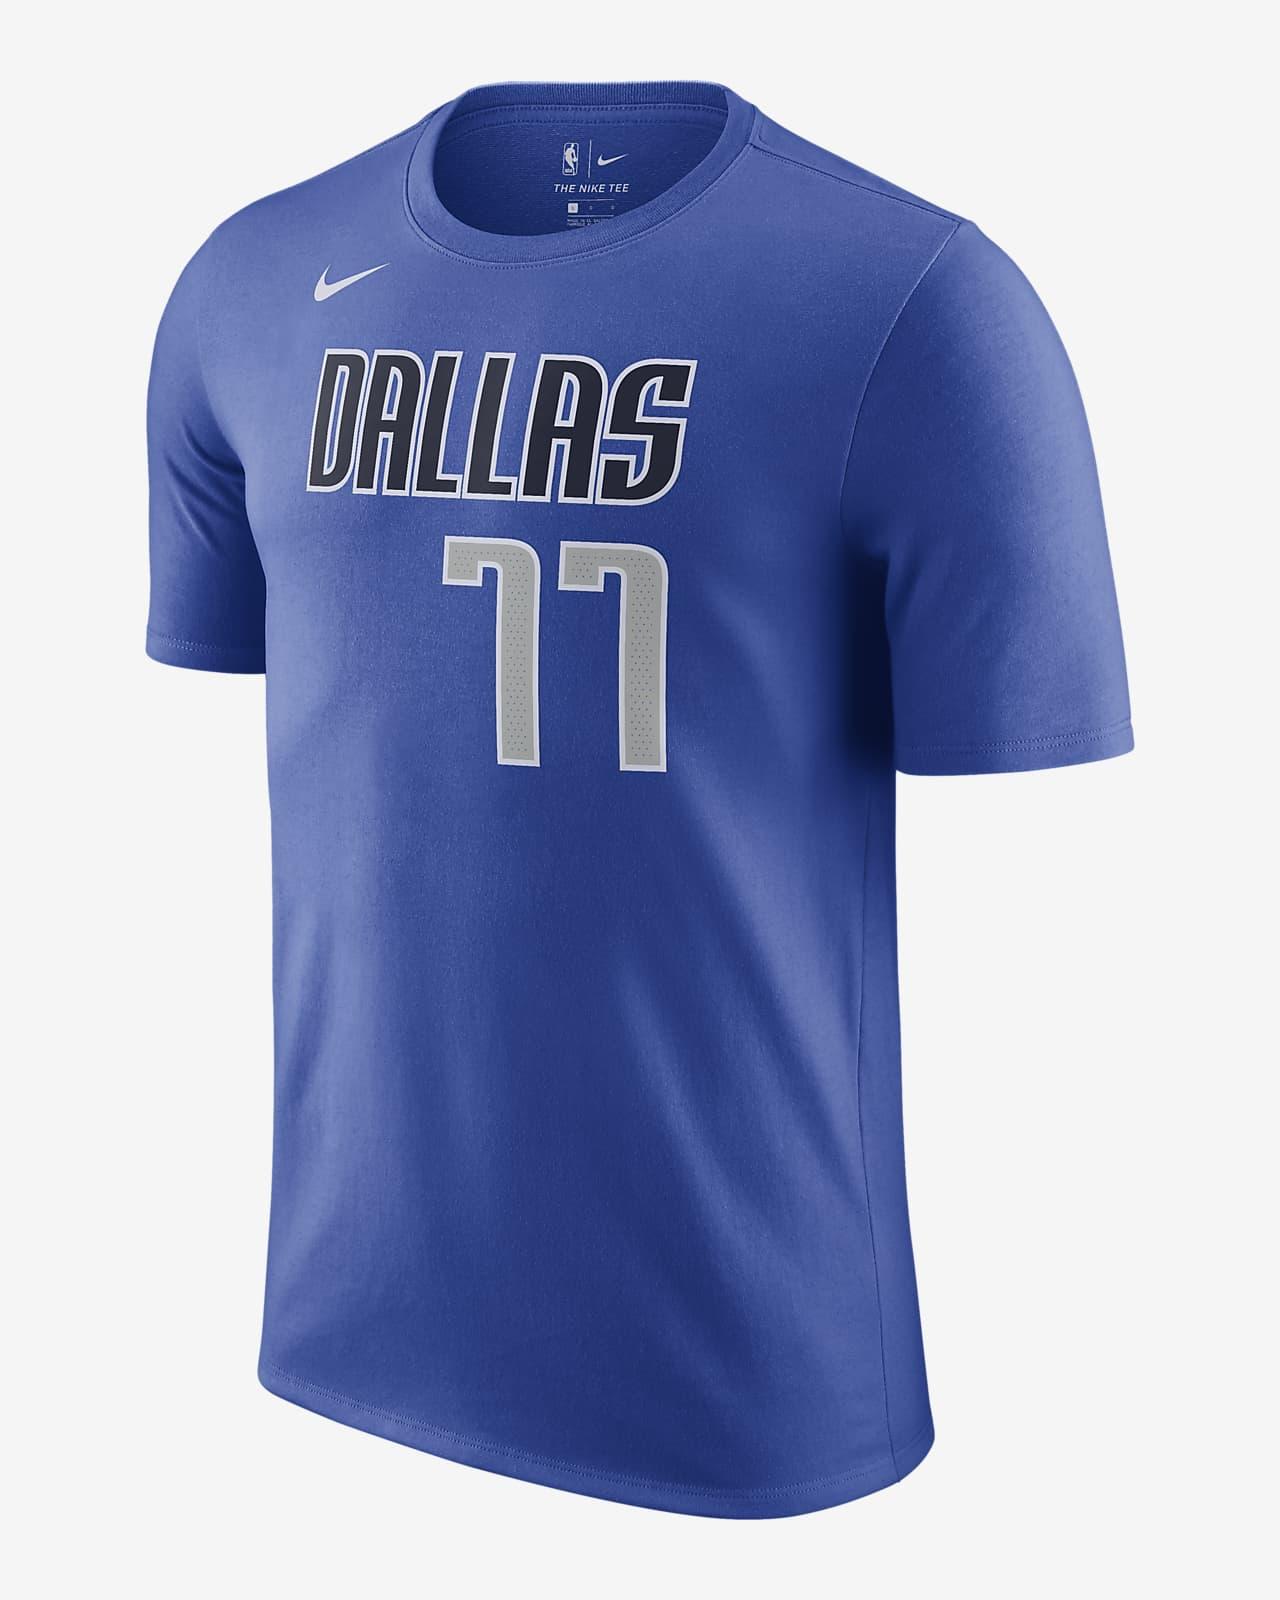 Tee-shirt Nike NBA Mavericks pour Homme